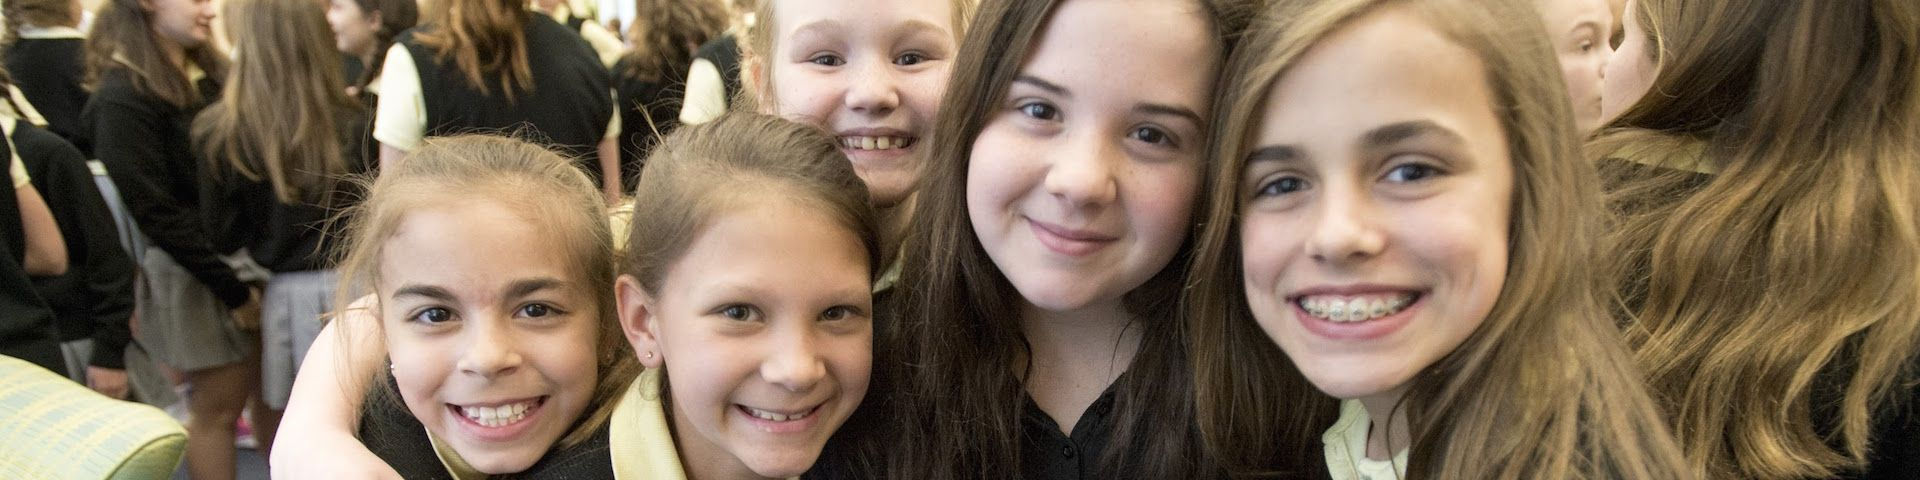 Middle School | Hutchison School for Girls in Memphis, TN